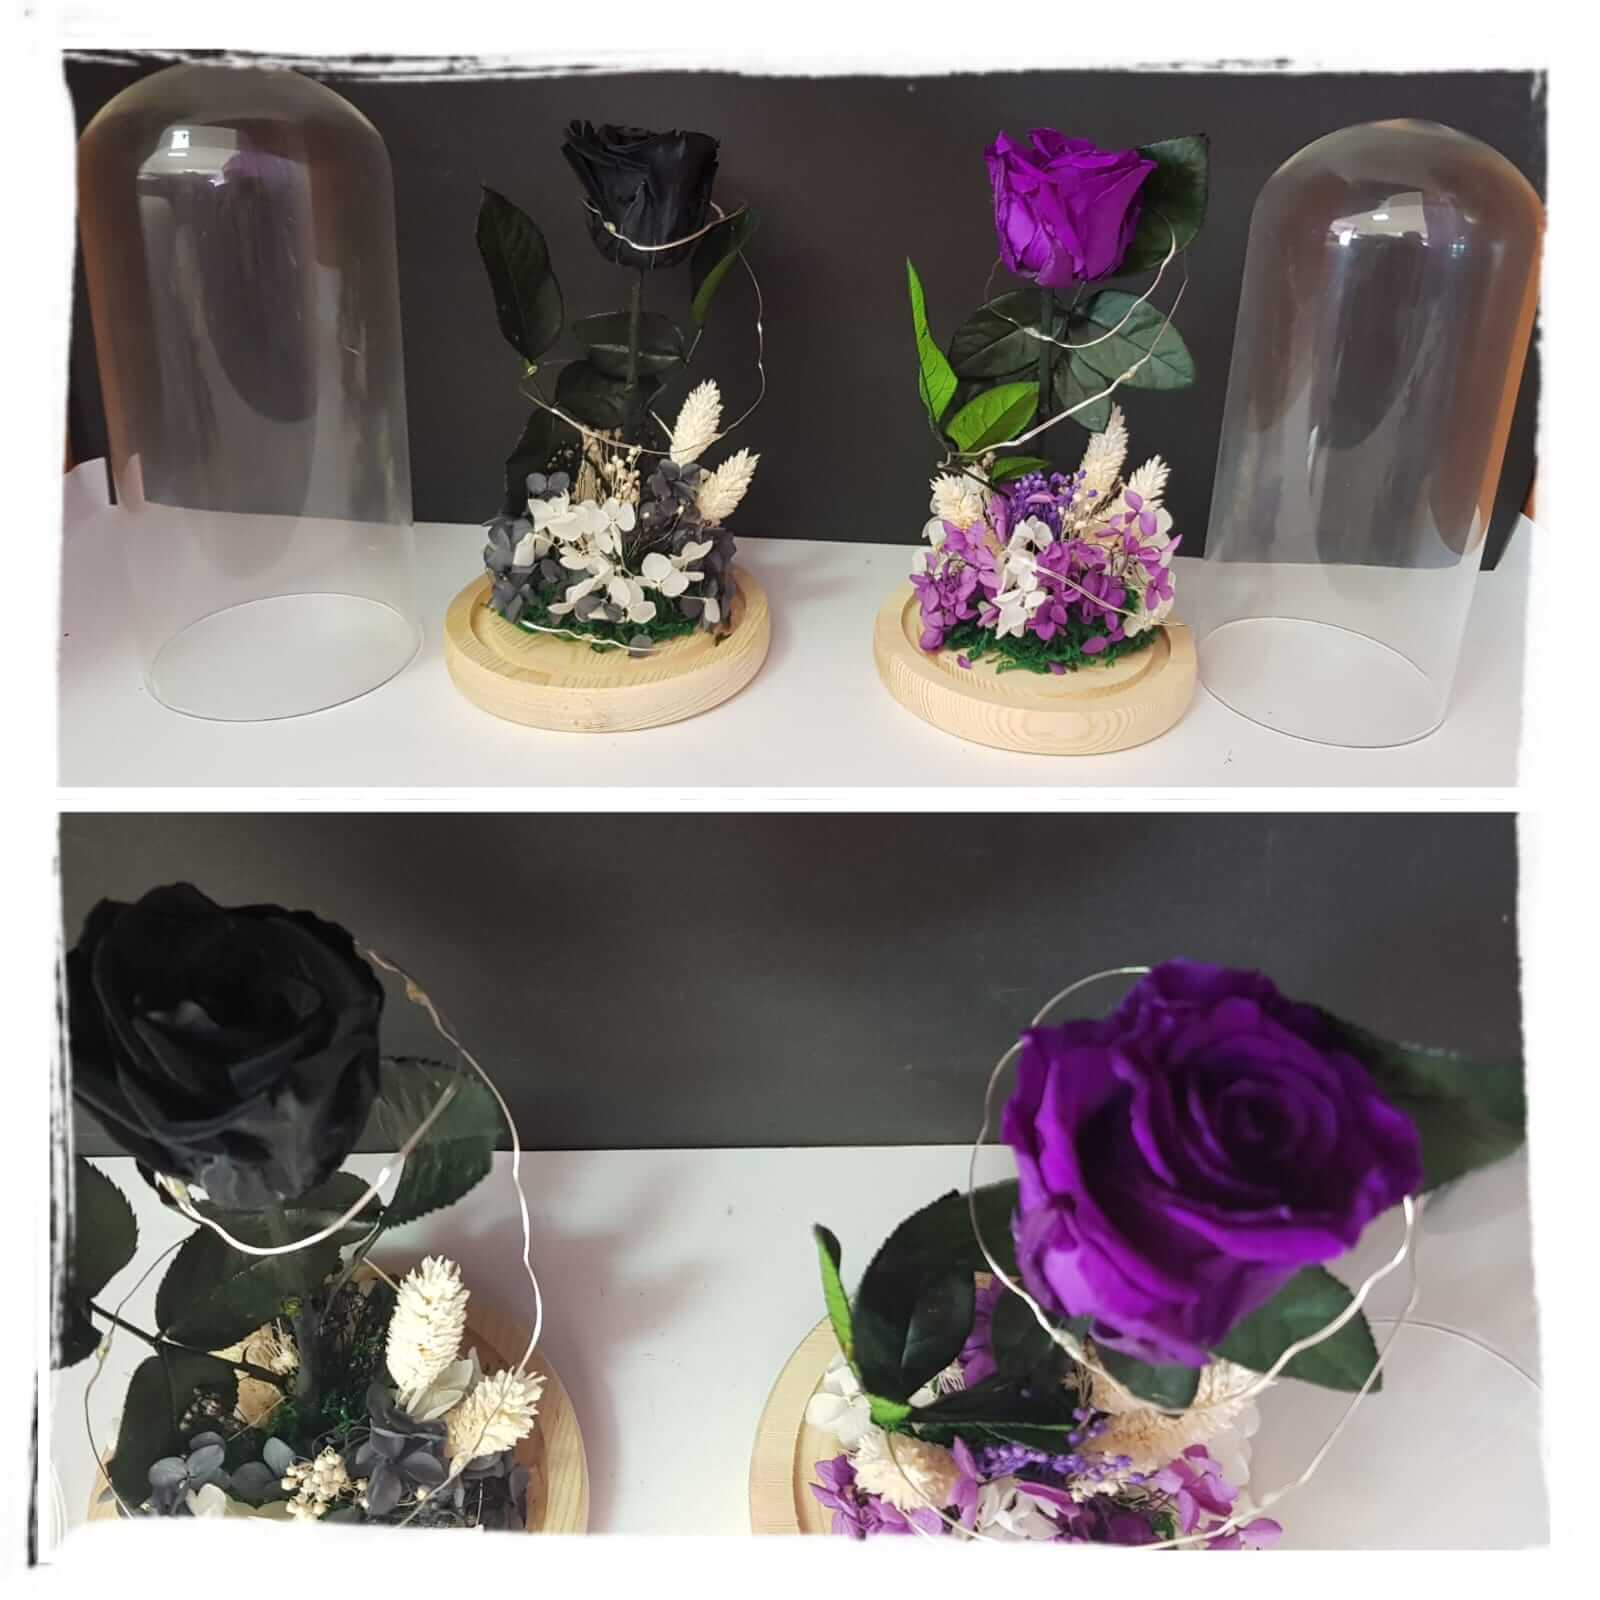 cupula de cristal cupula de cristal - cupula de cristal - Cúpula de cristal con rosa preservada